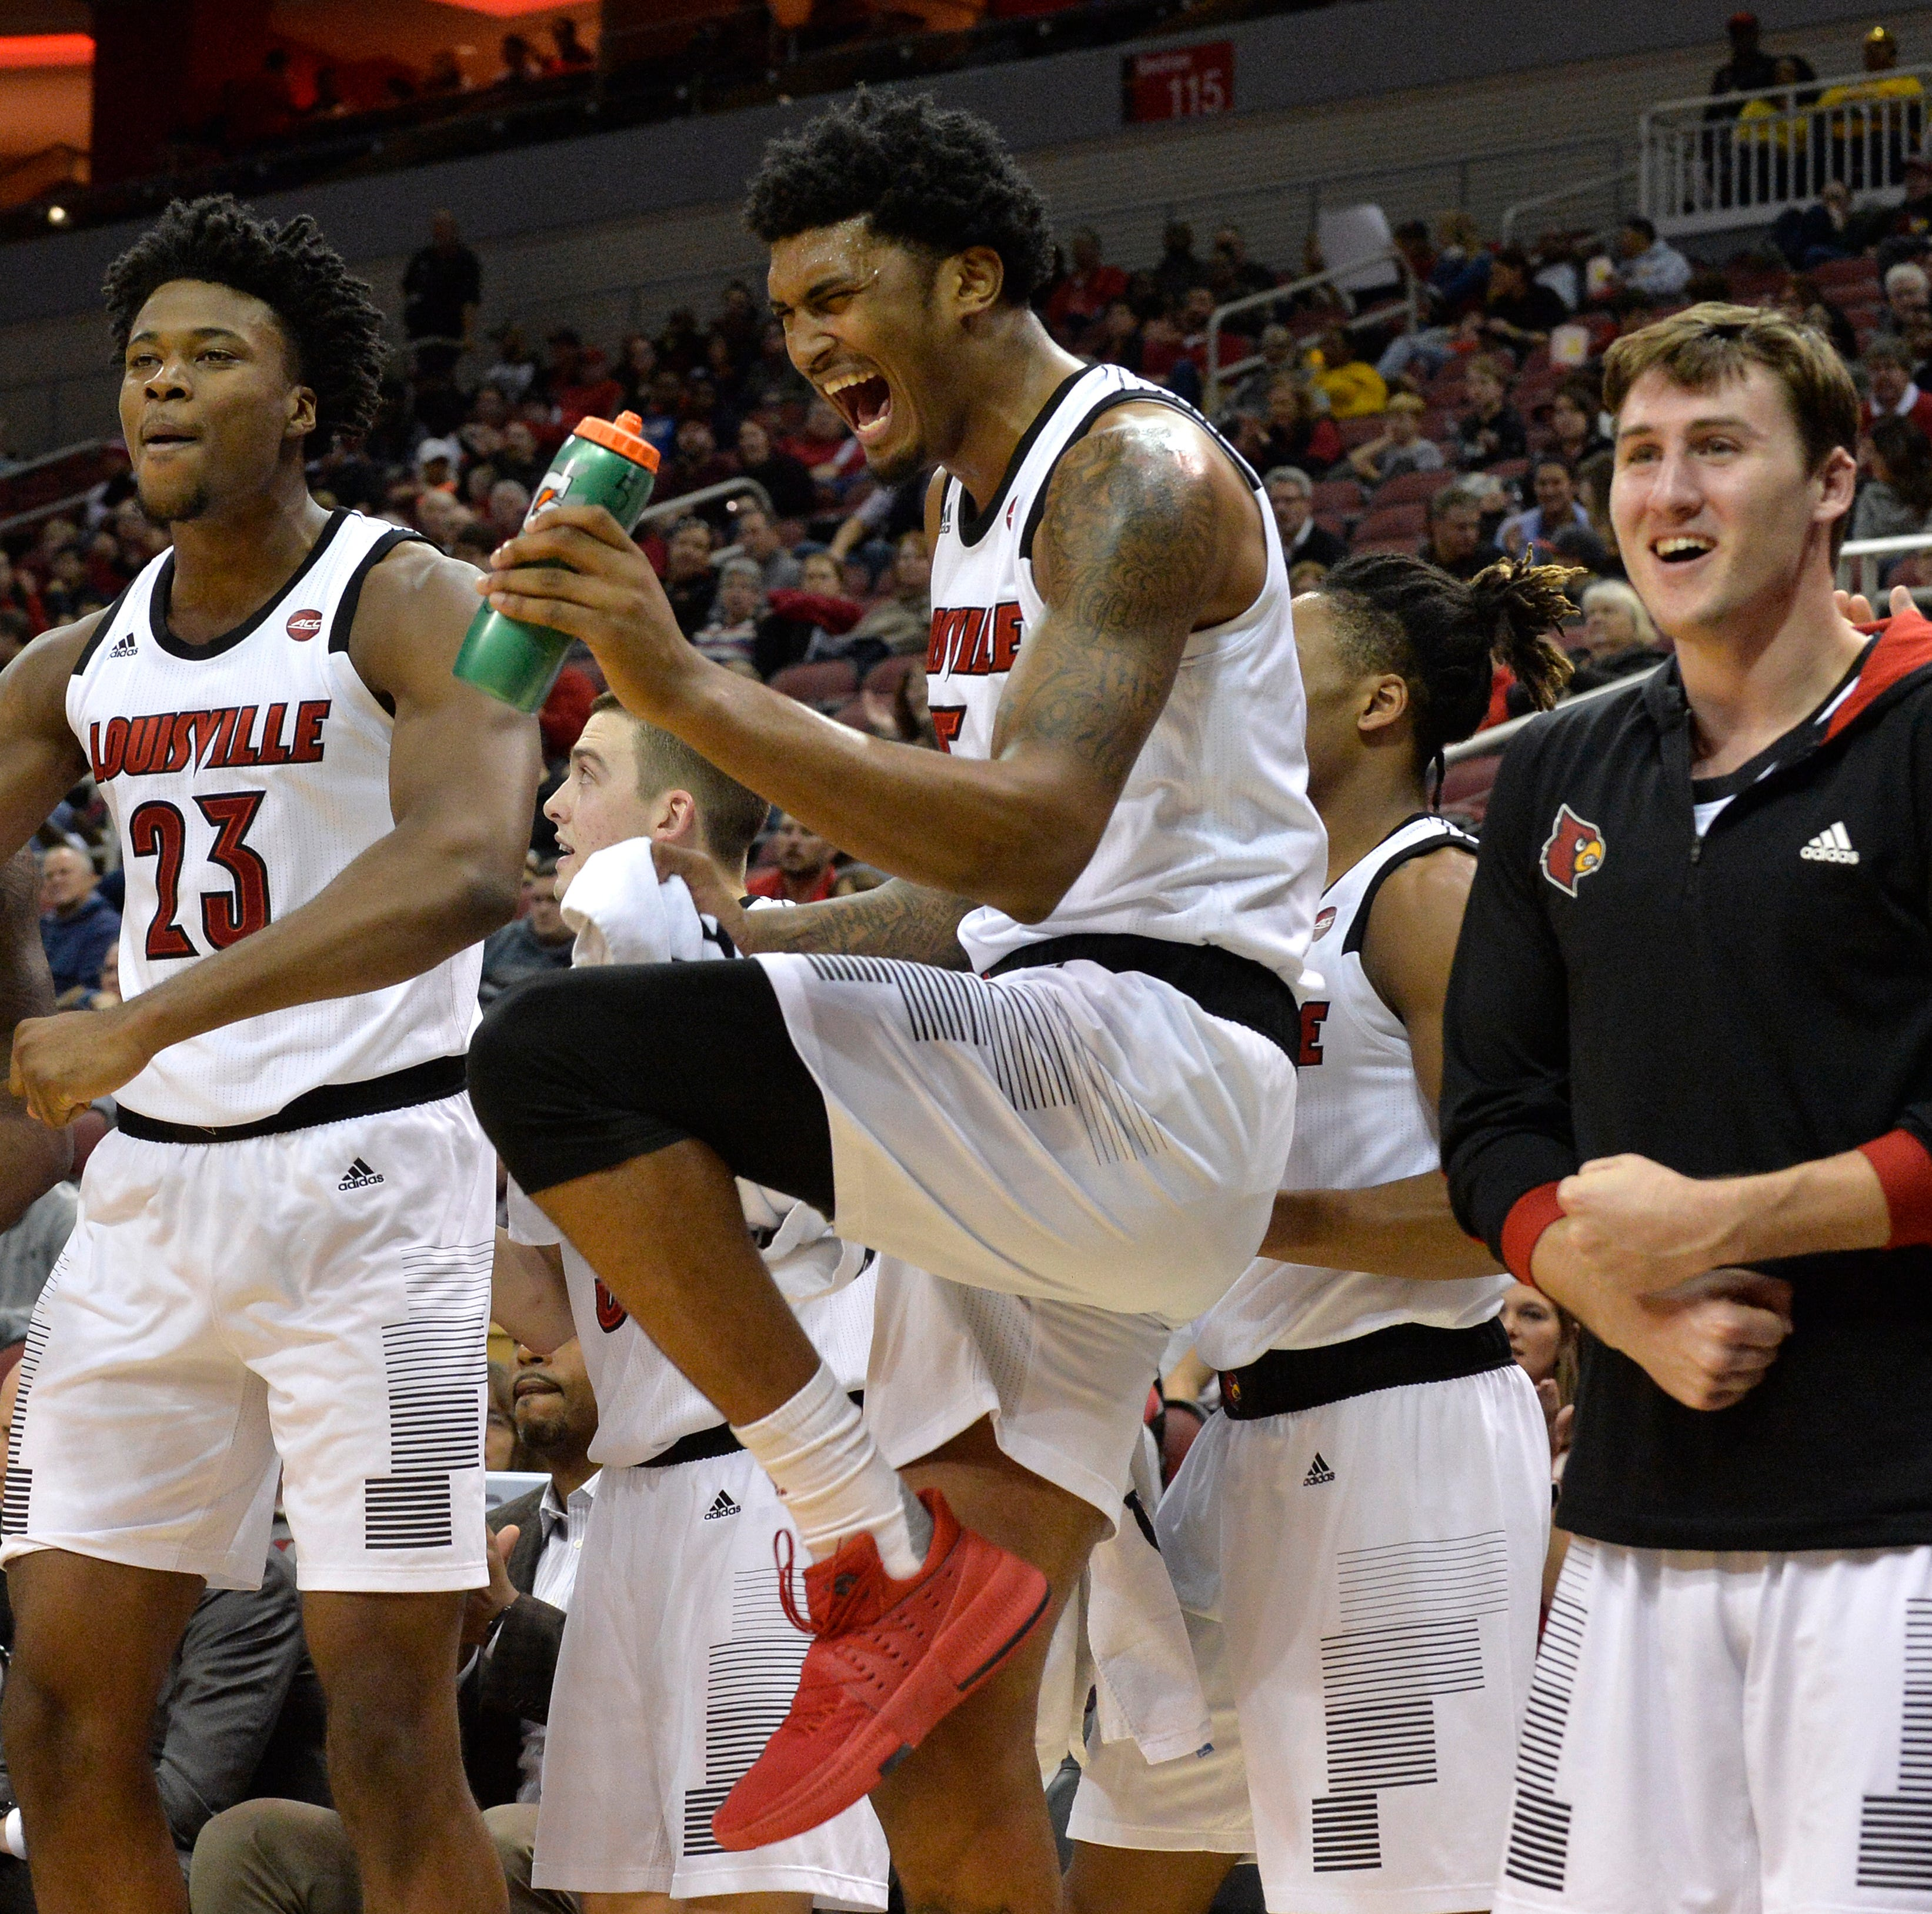 How to watch Louisville basketball's season opener vs. Nicholls State